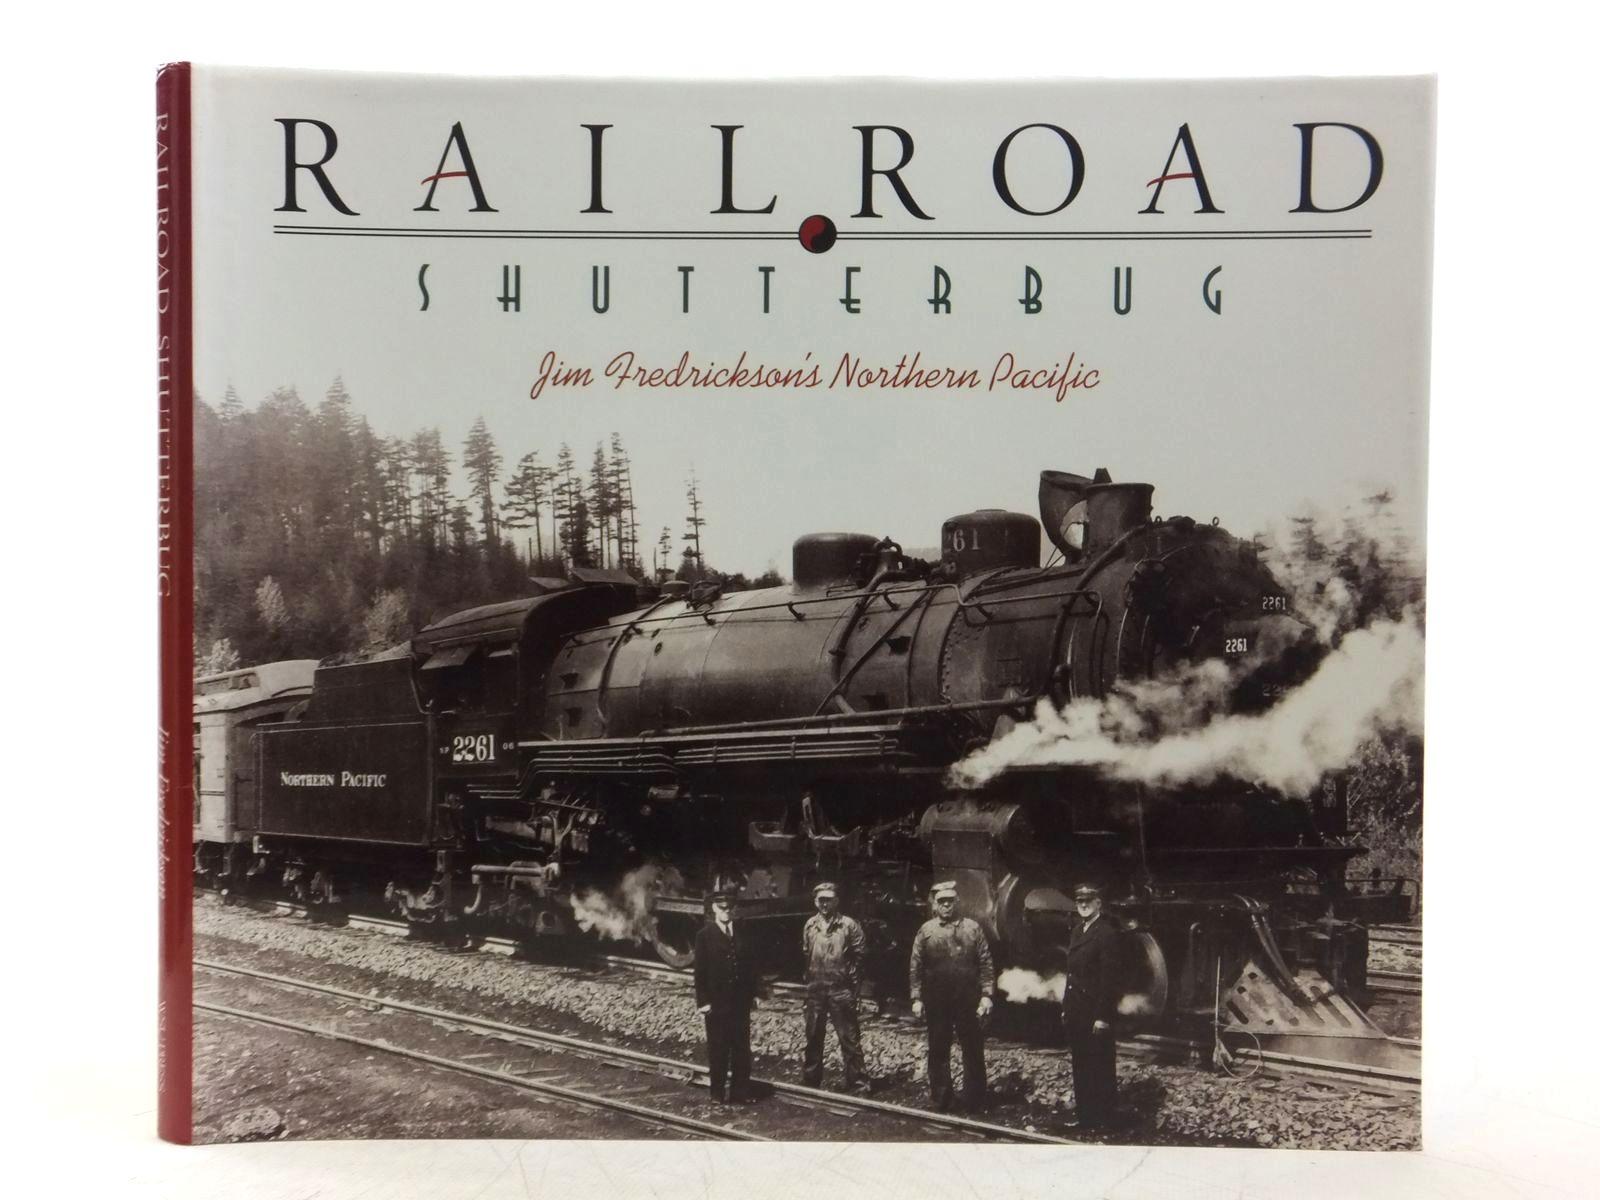 Photo of RAILROAD SHUTTERBUG written by Fredrickson, Jim published by Washington State University Press (STOCK CODE: 1607621)  for sale by Stella & Rose's Books